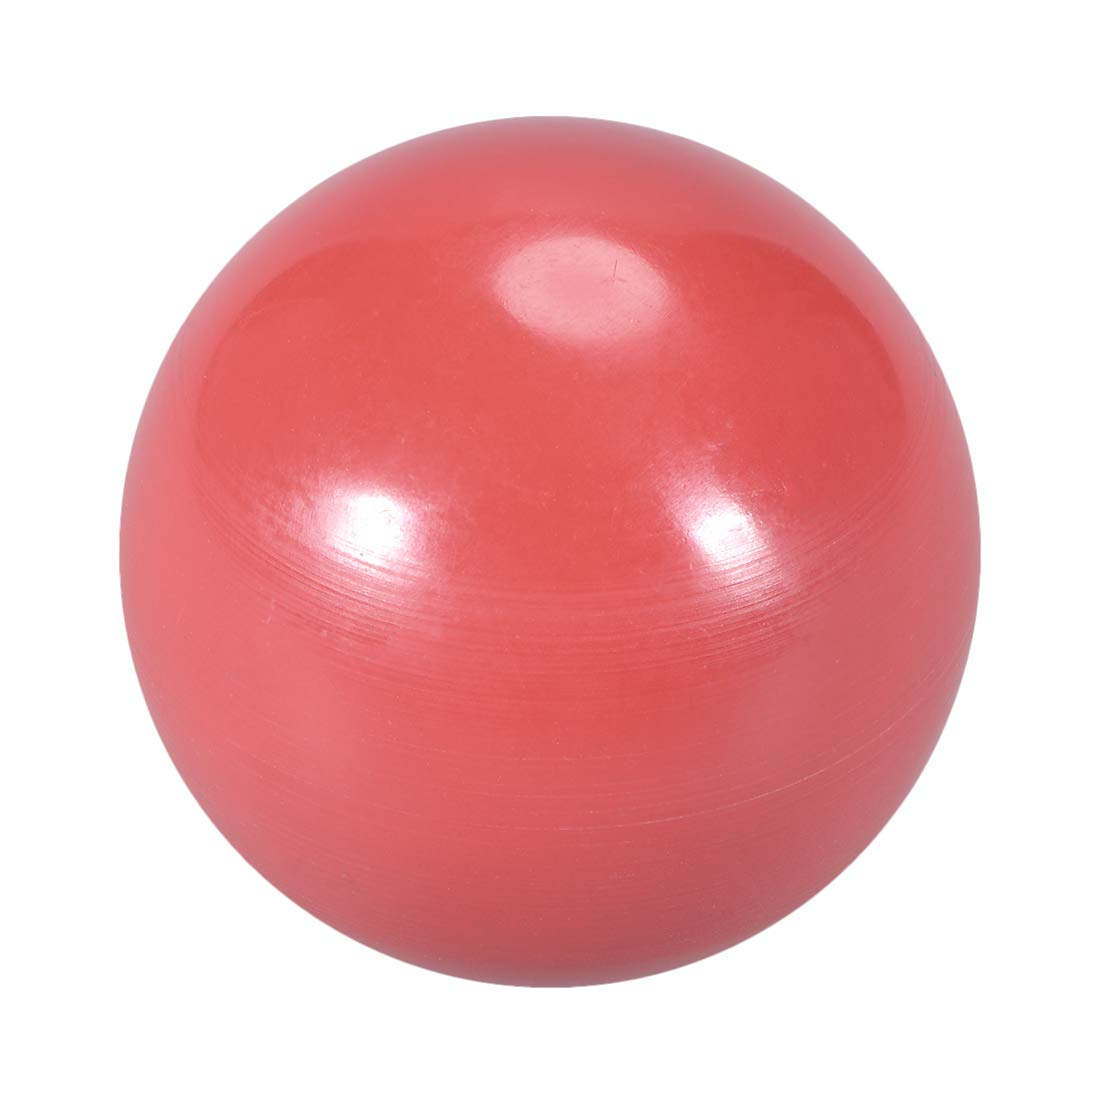 uxcell 15 Pcs Thermoset Ball Knob M6 Female Thread Machine Handle 30mm Diameter Smooth Rim Red